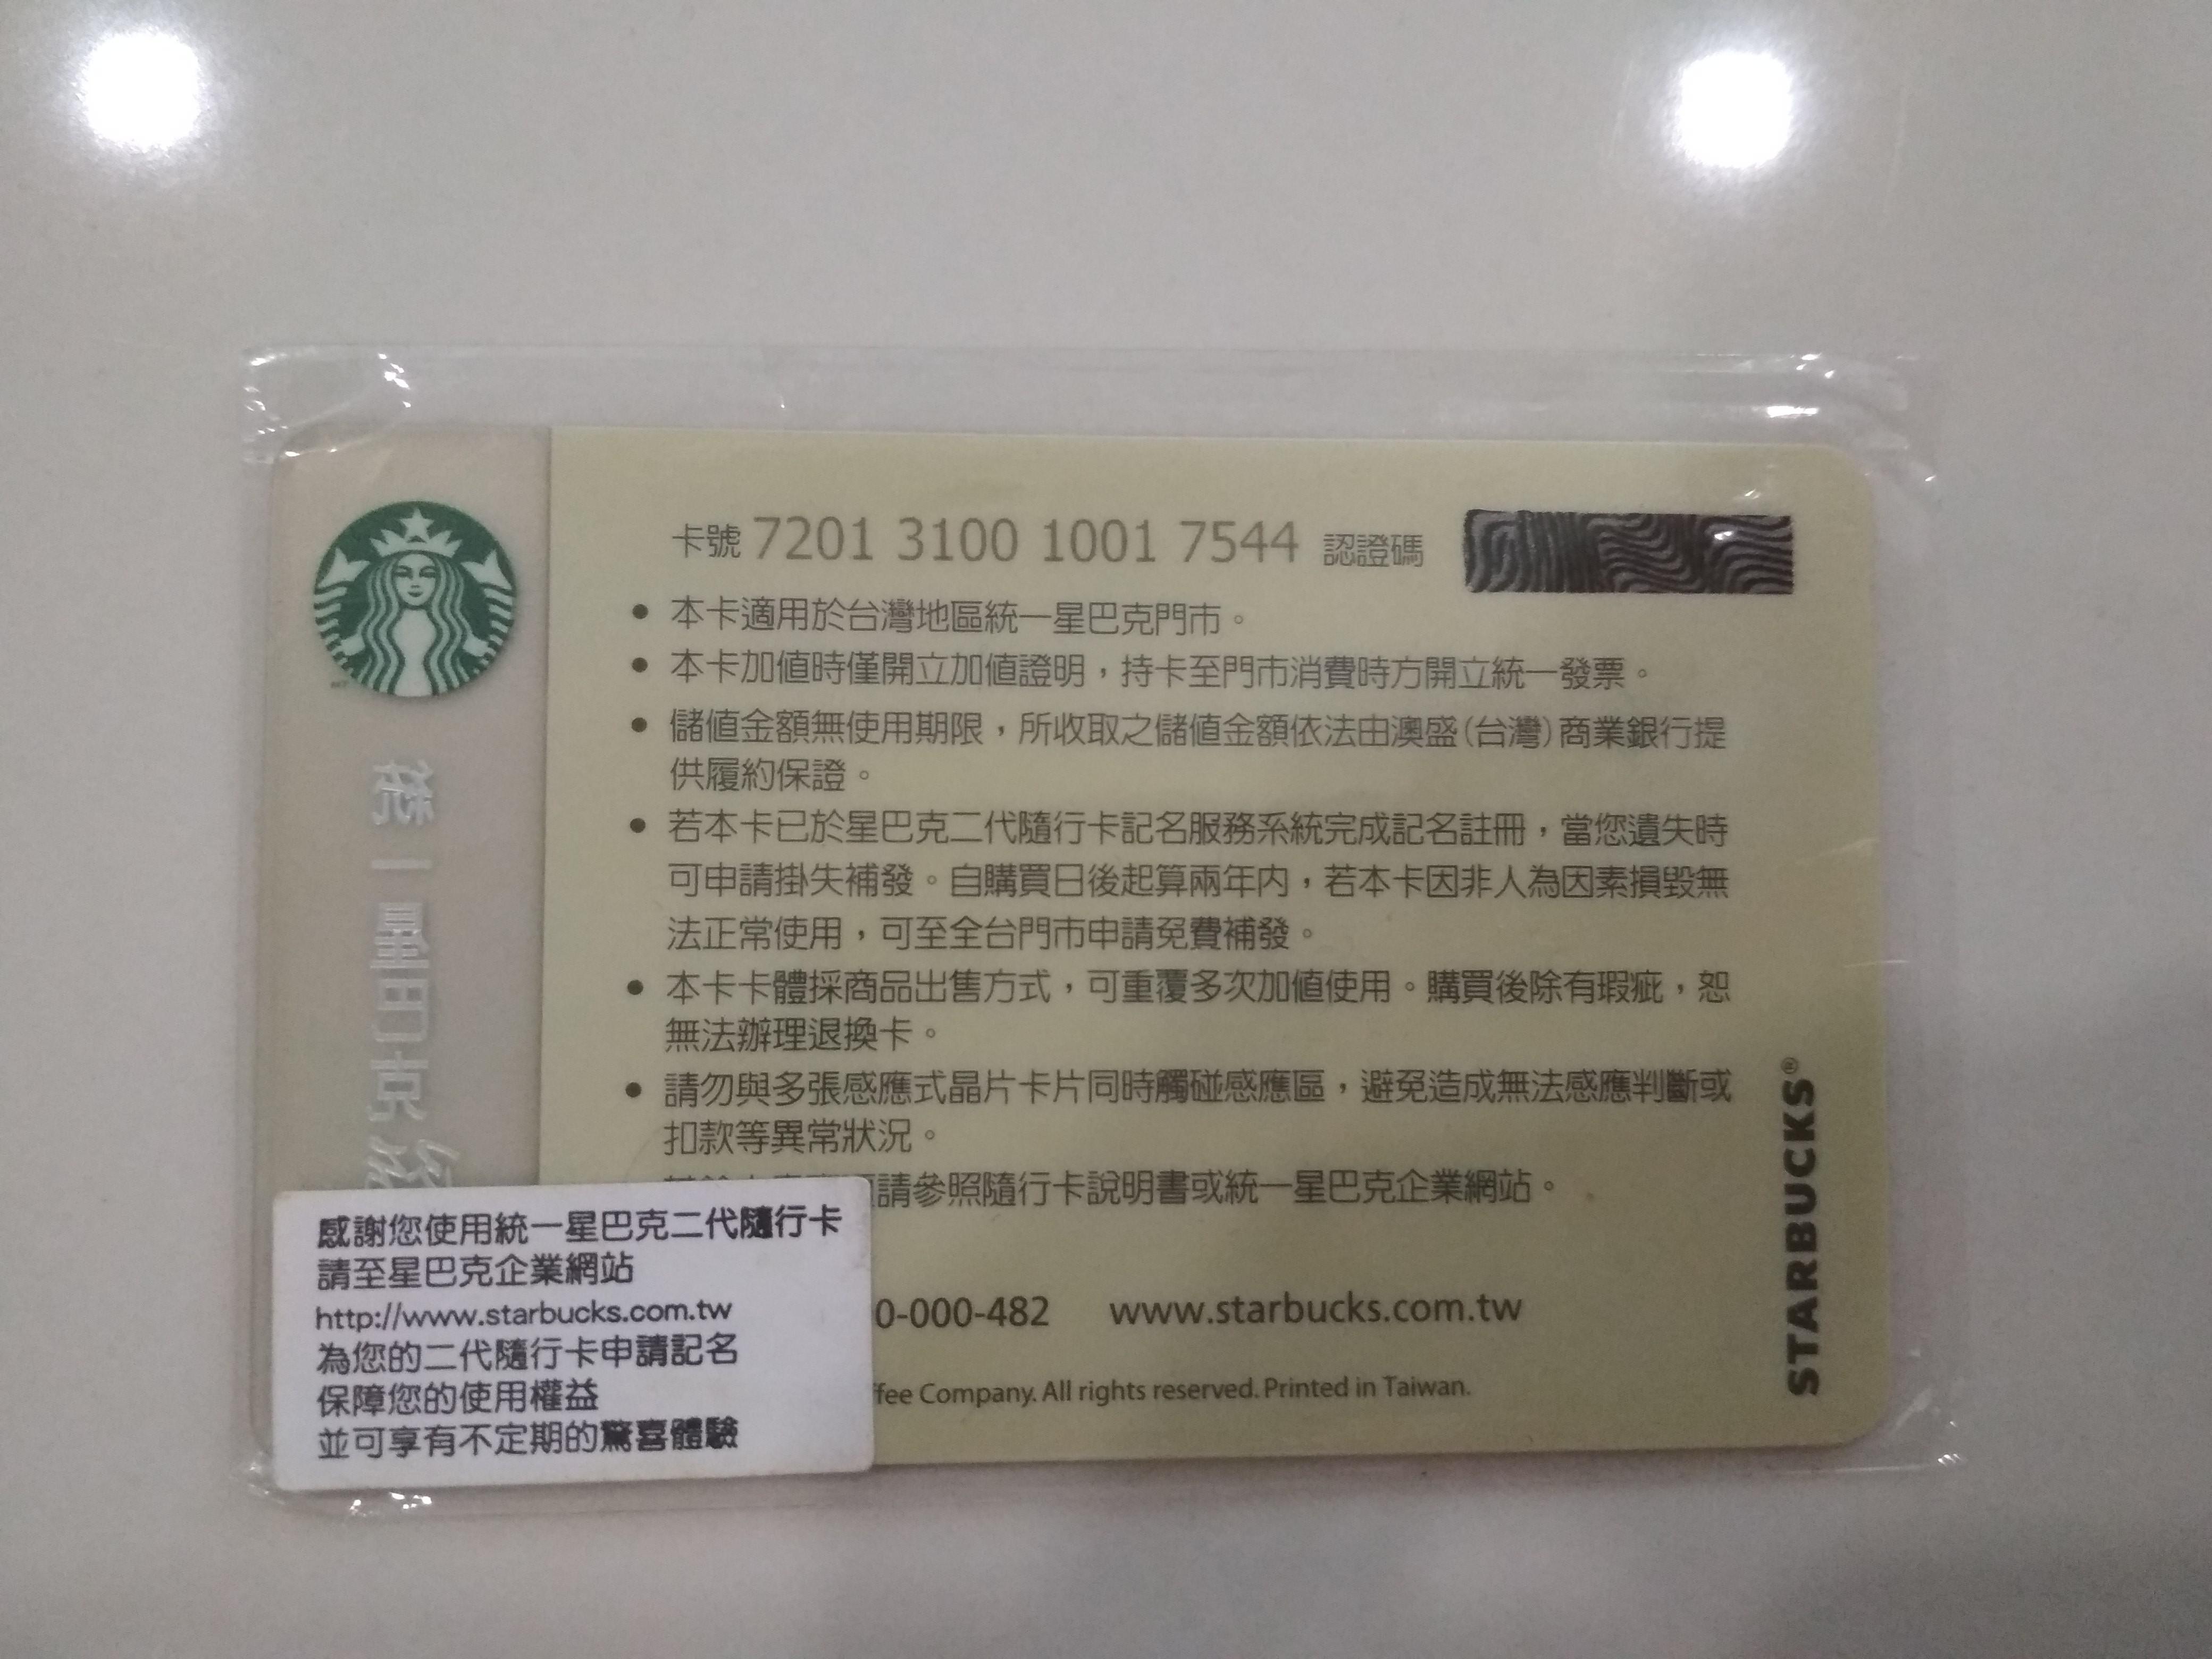 📍Starbucks Taiwan Card Collection